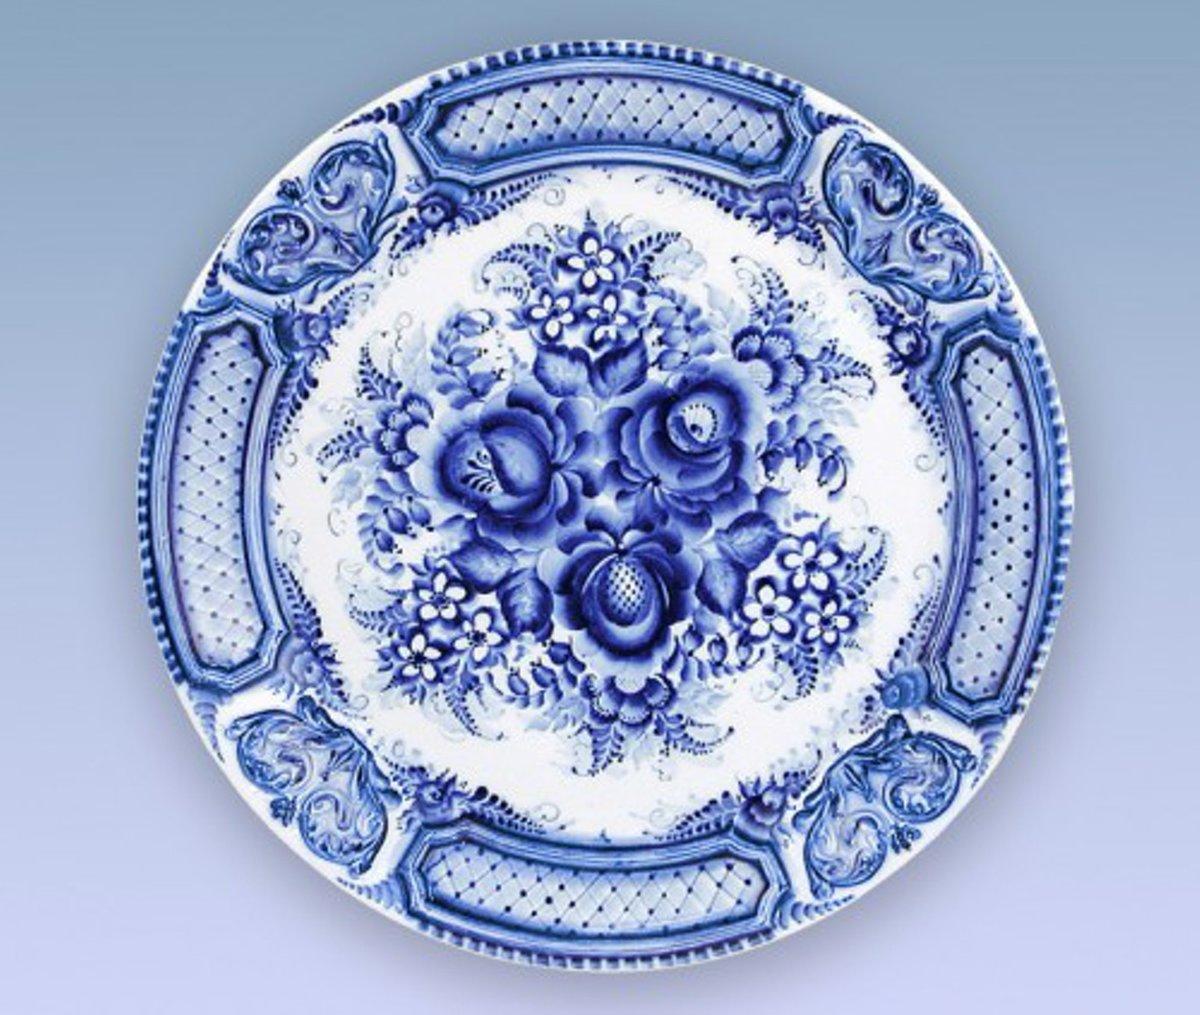 Узоры на посуде картинки гжель